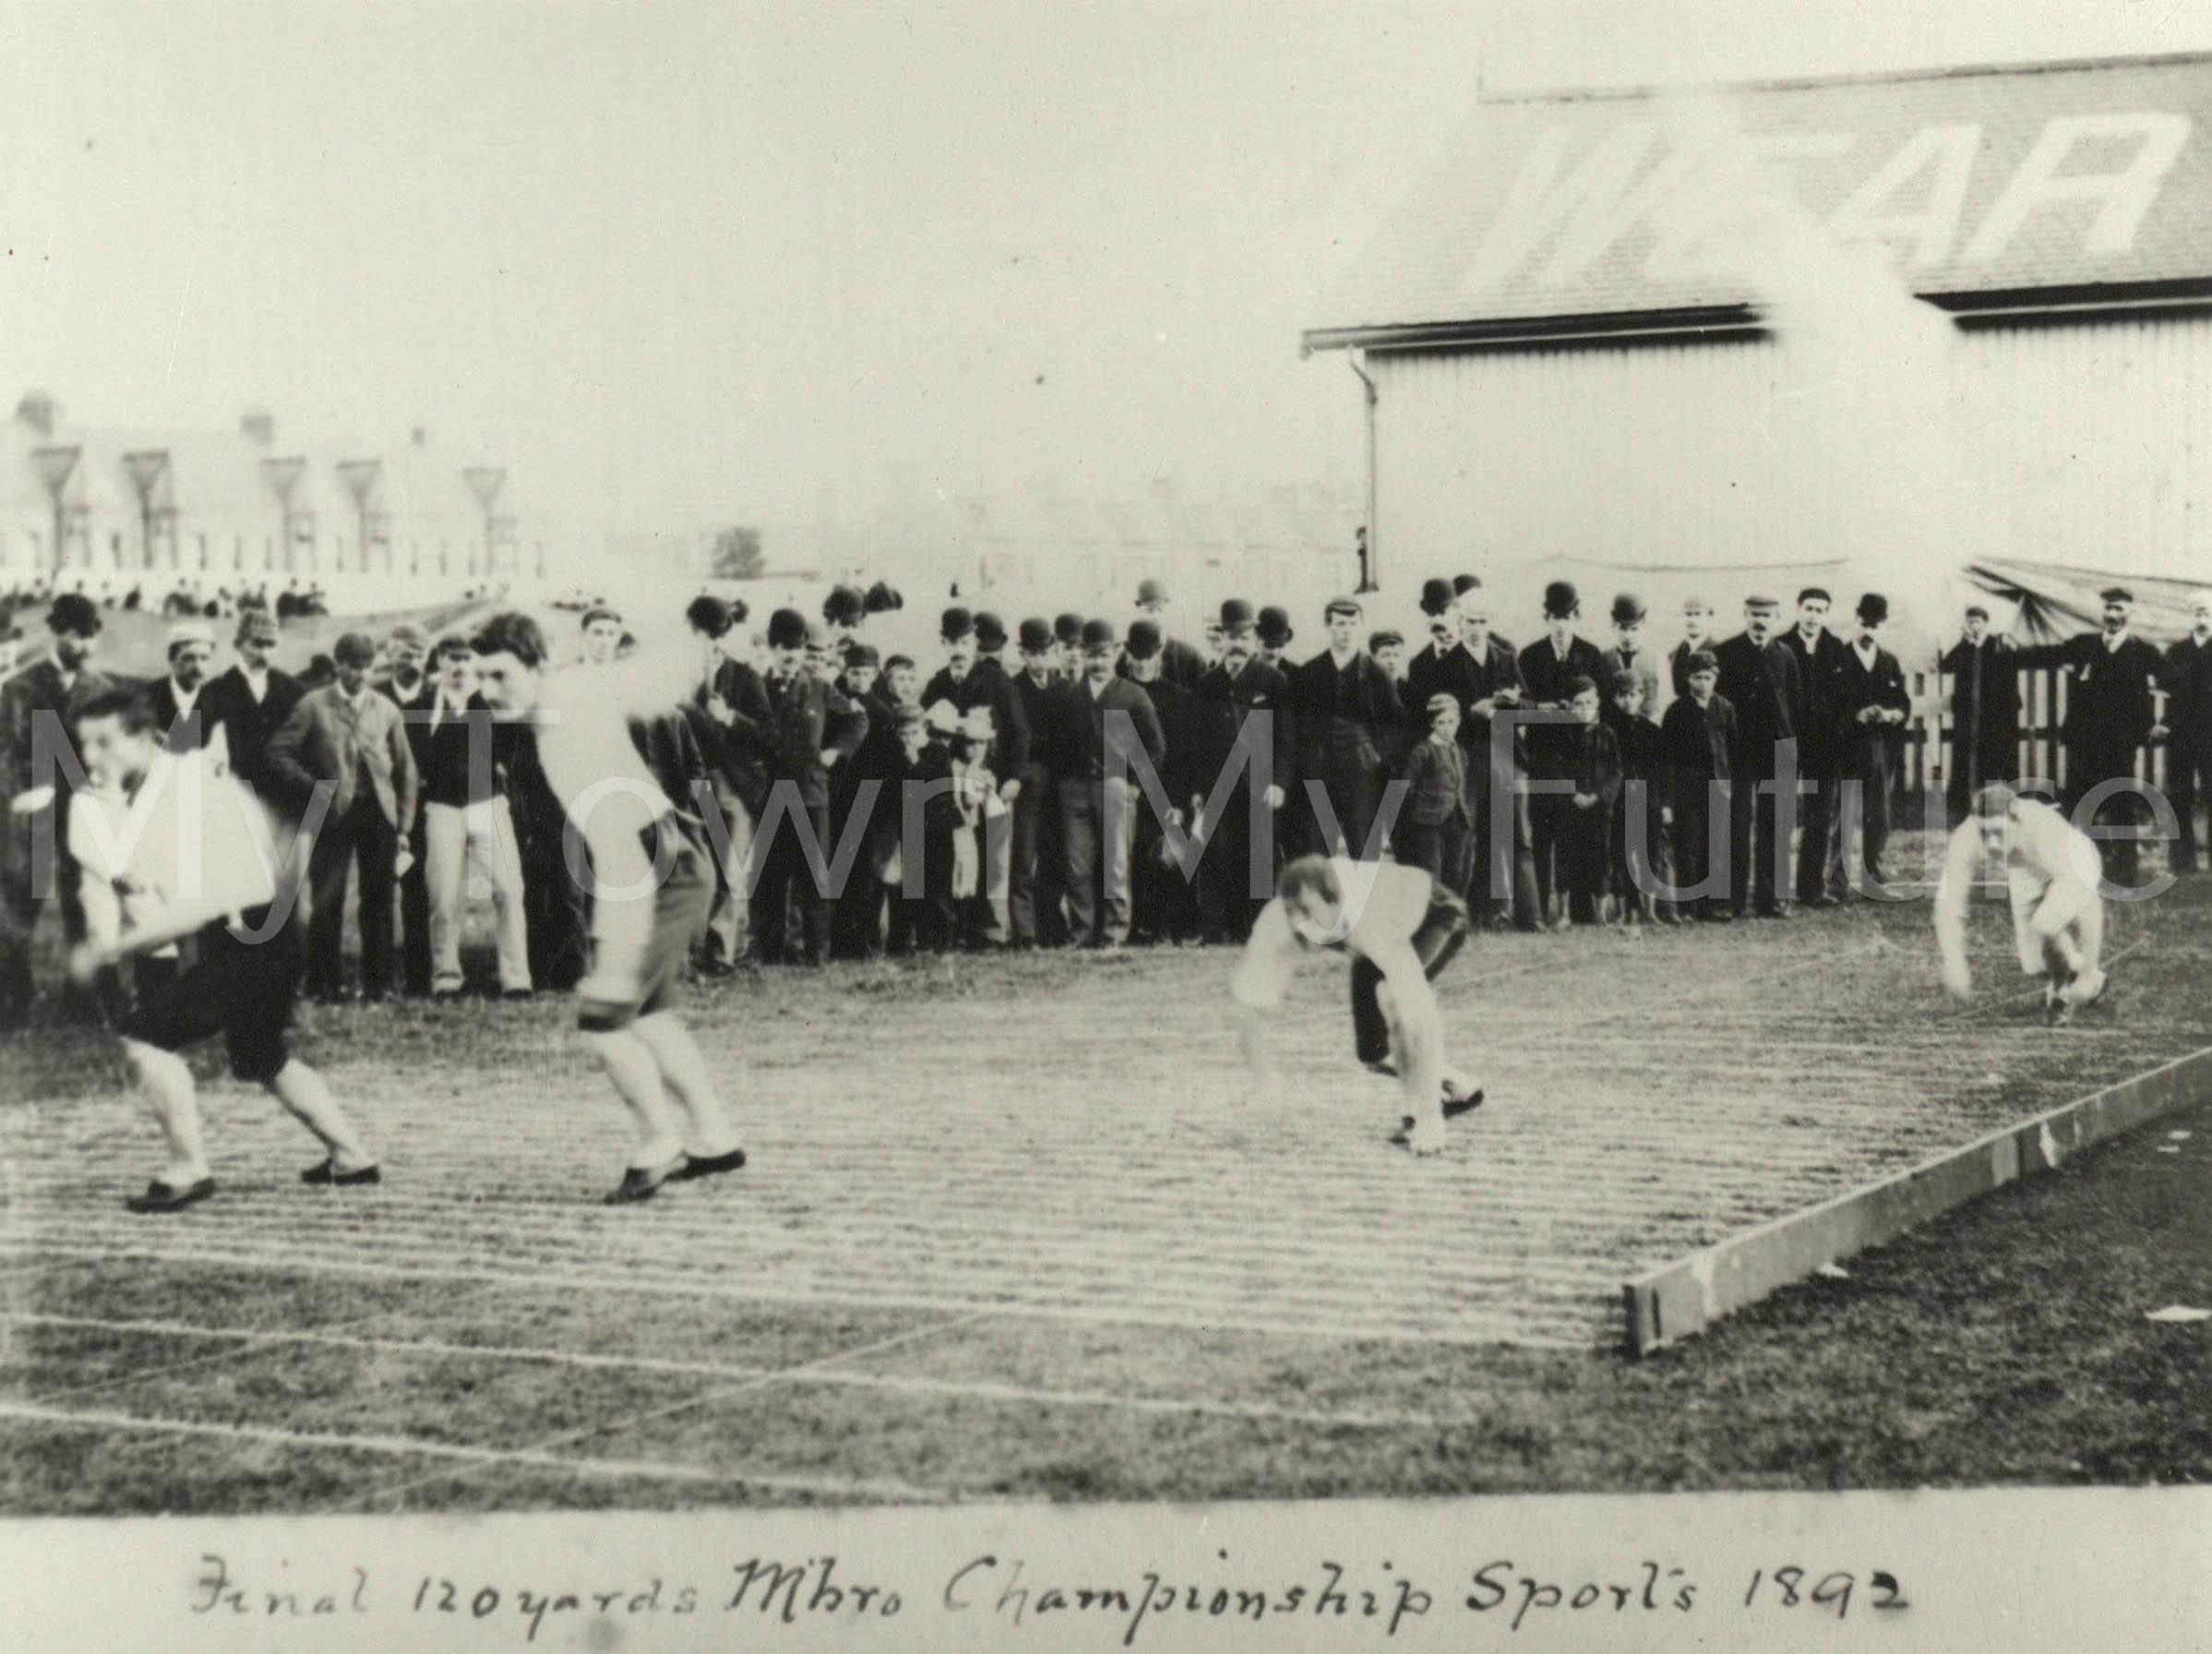 Middlesbrough Athletic Club1892